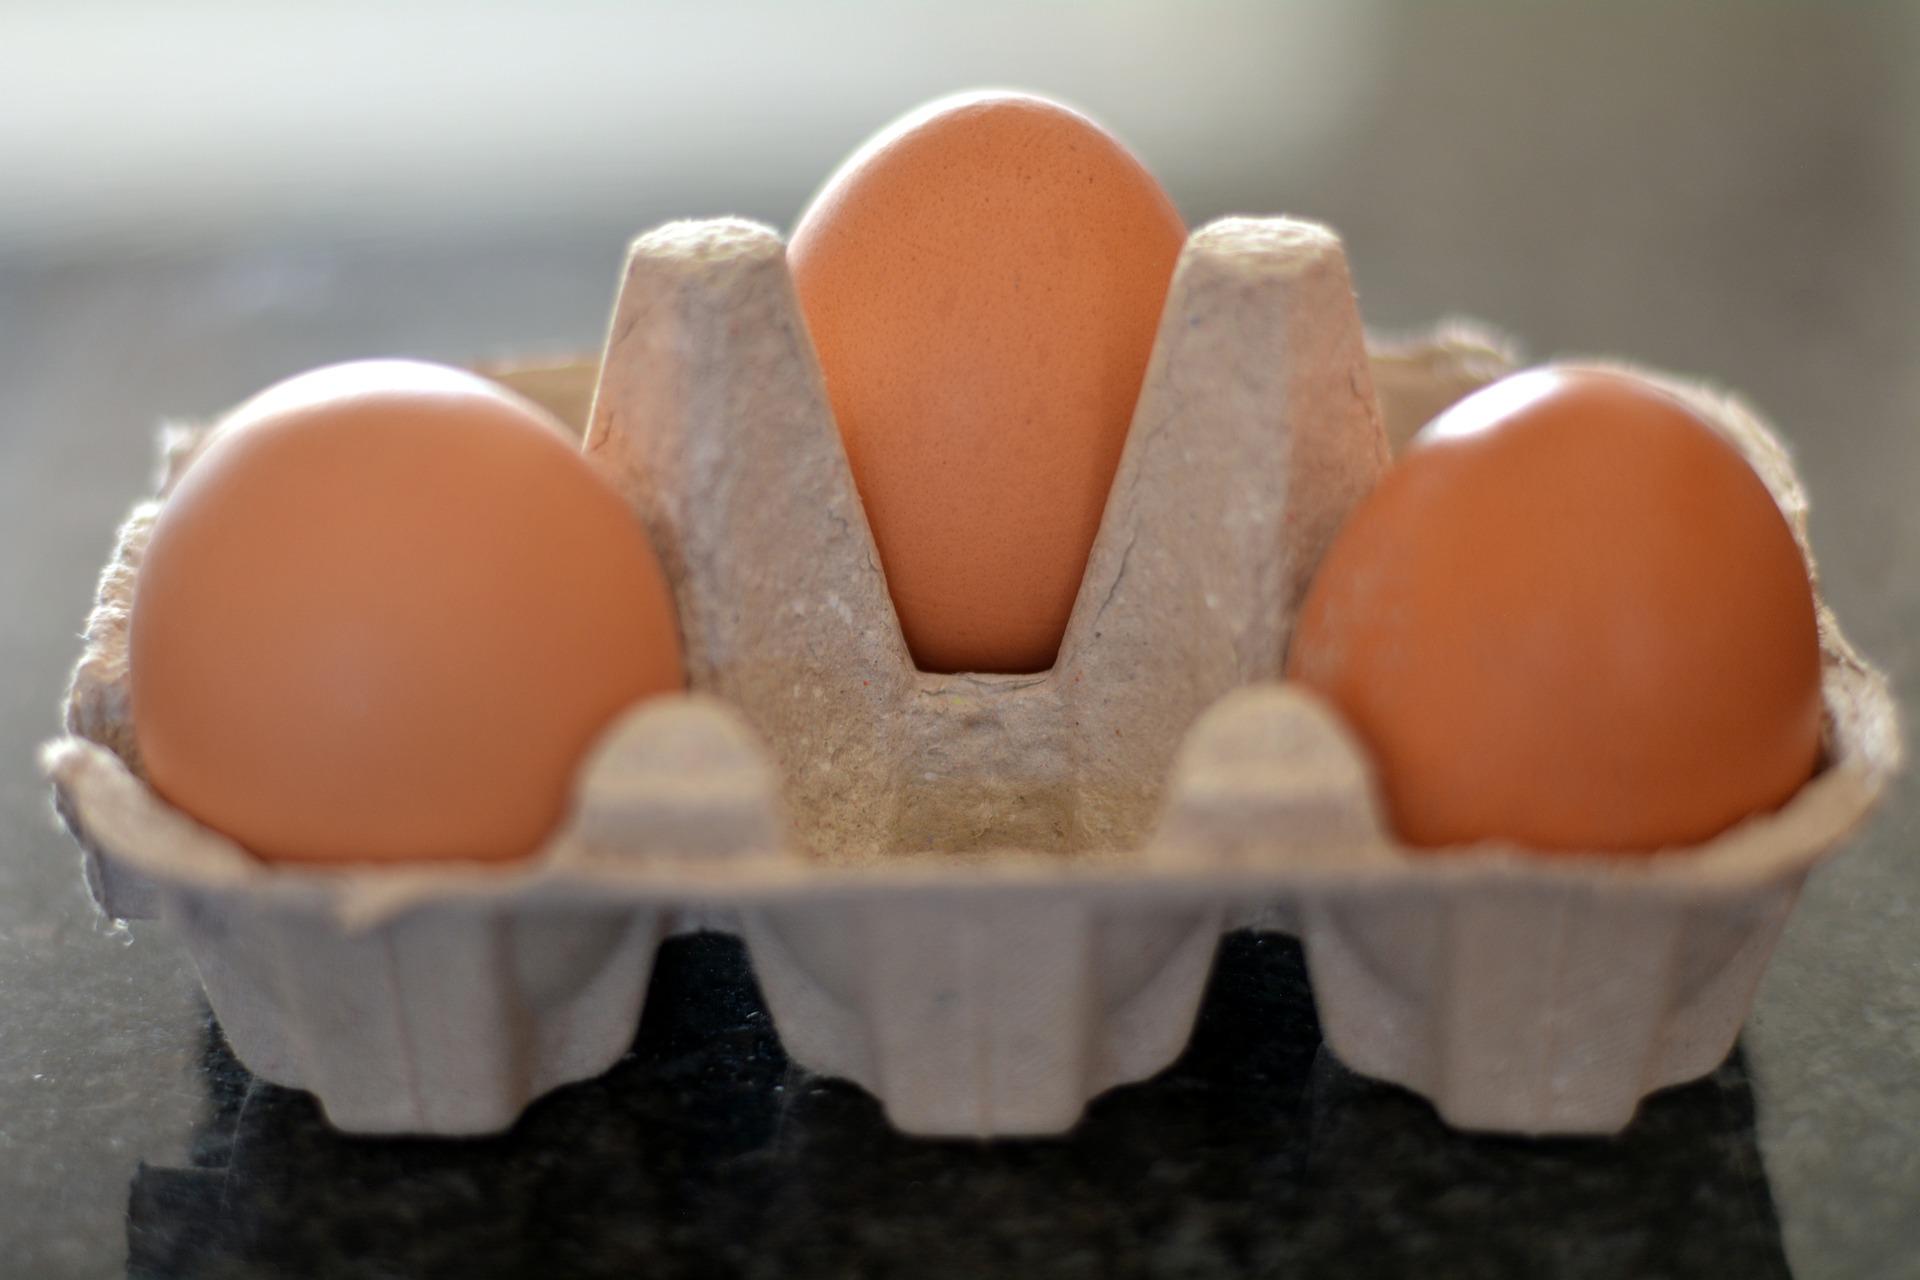 three-eggs-1709042_1920